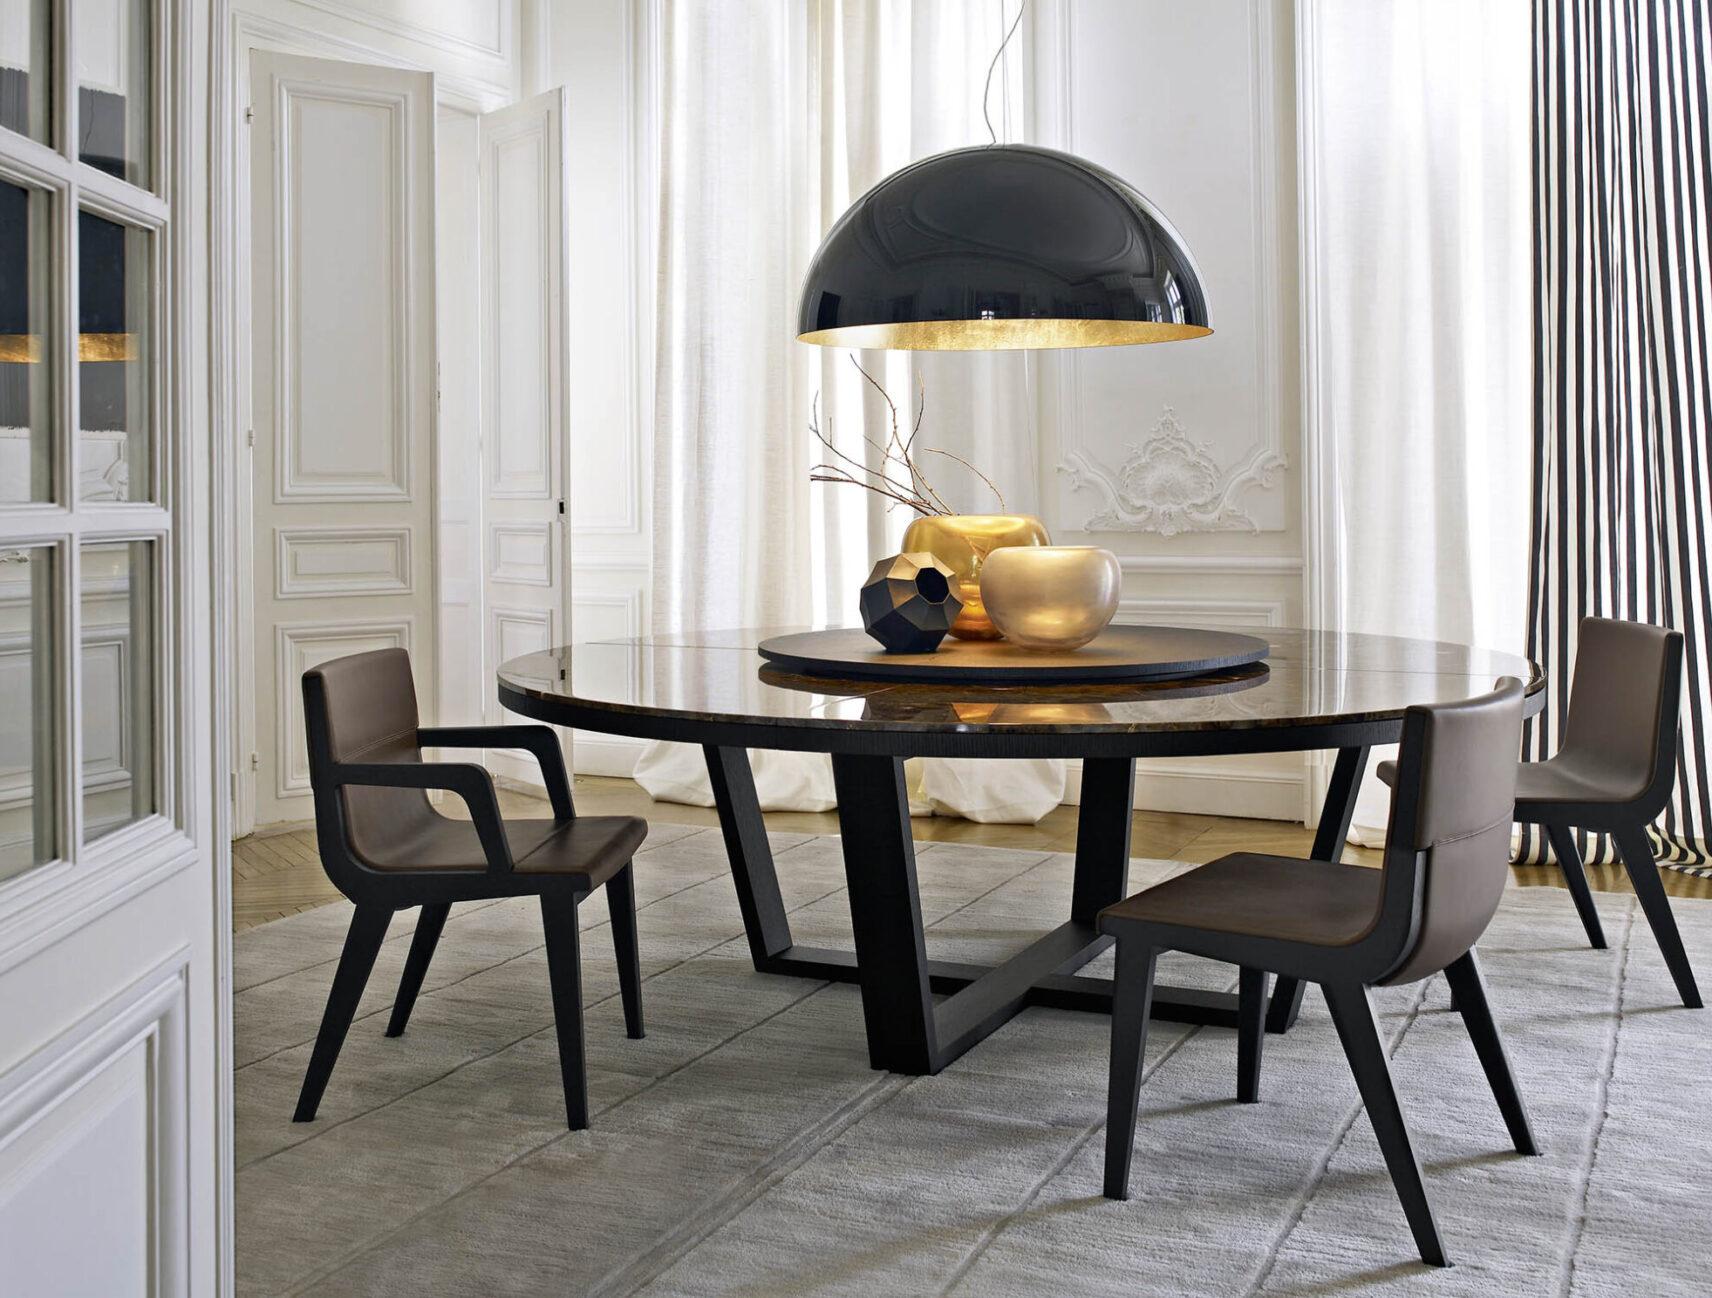 Tisch Xilos Der Acro Collection Von Maxalto